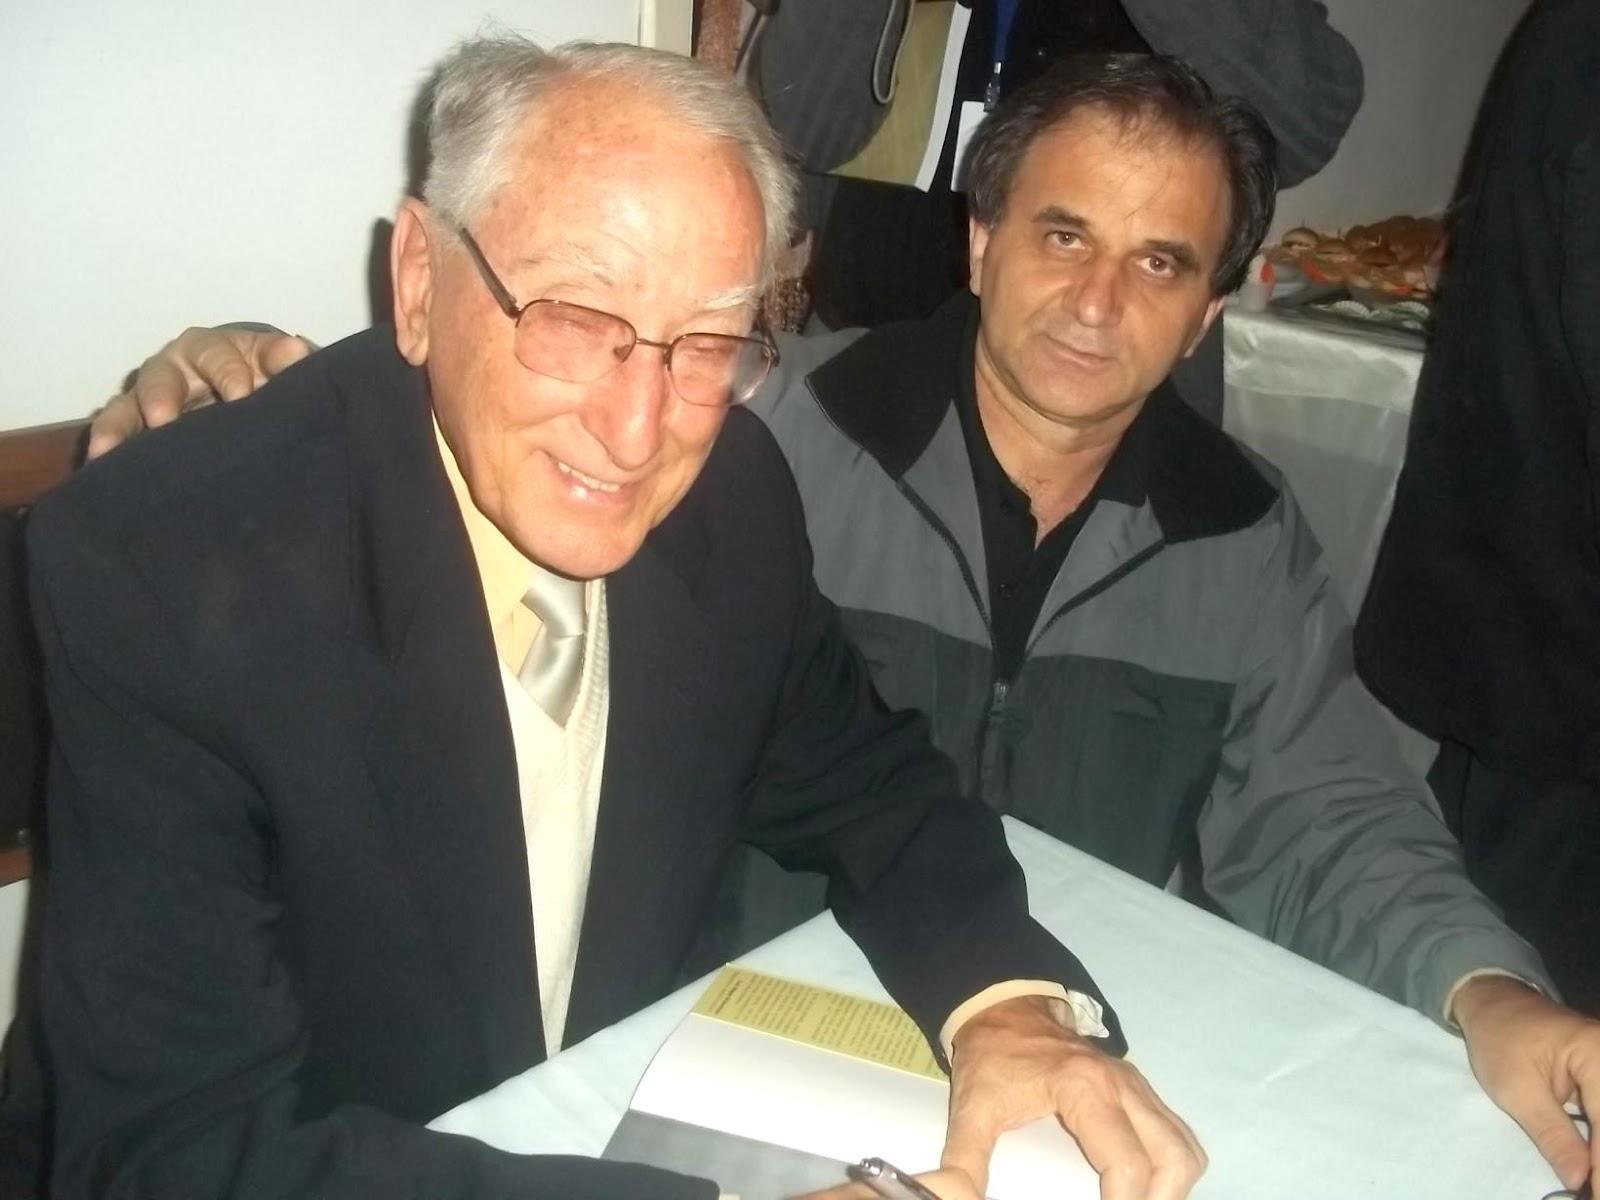 Airton Engster dos Santos e Werner Schinke